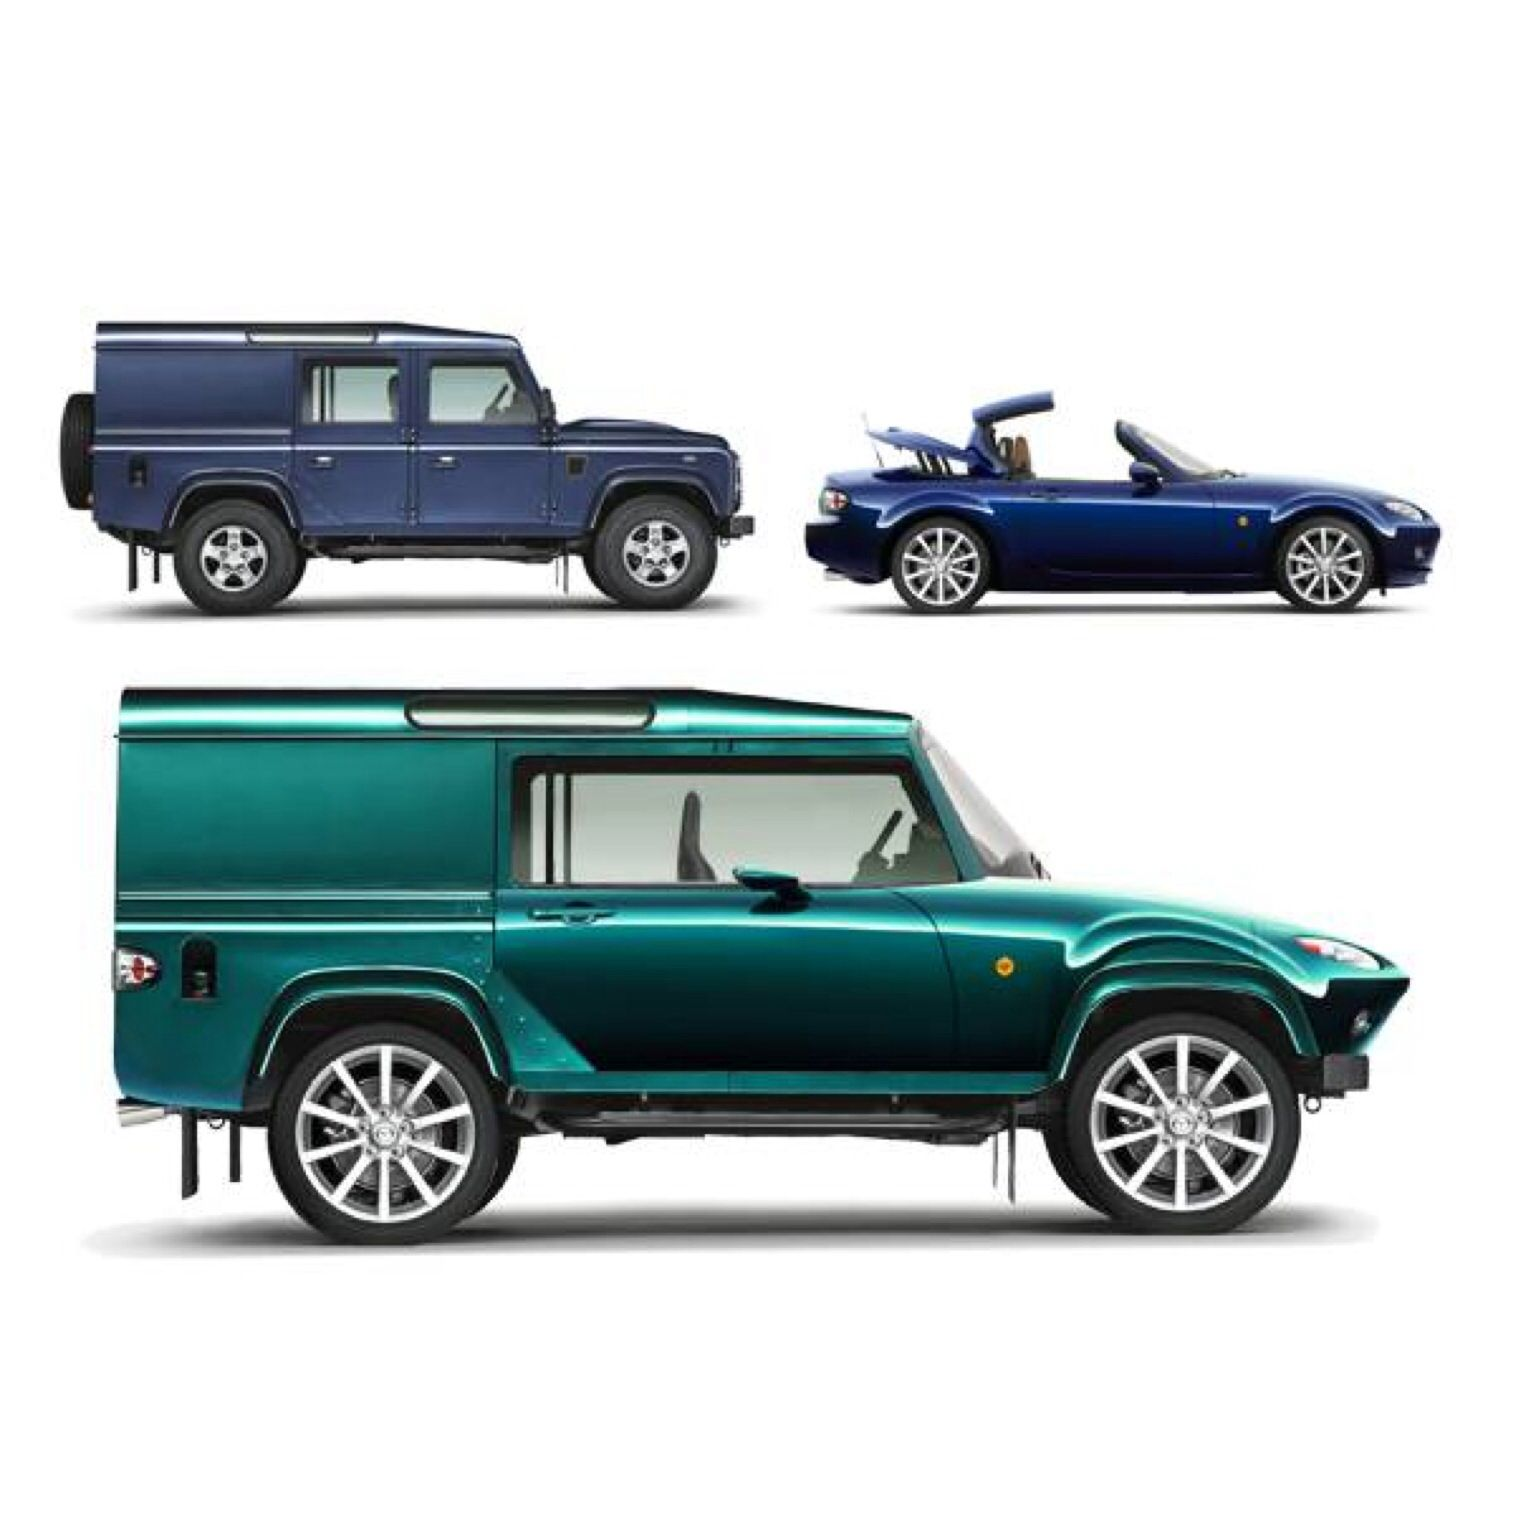 173 New SUVs In Stock - Delray Beach